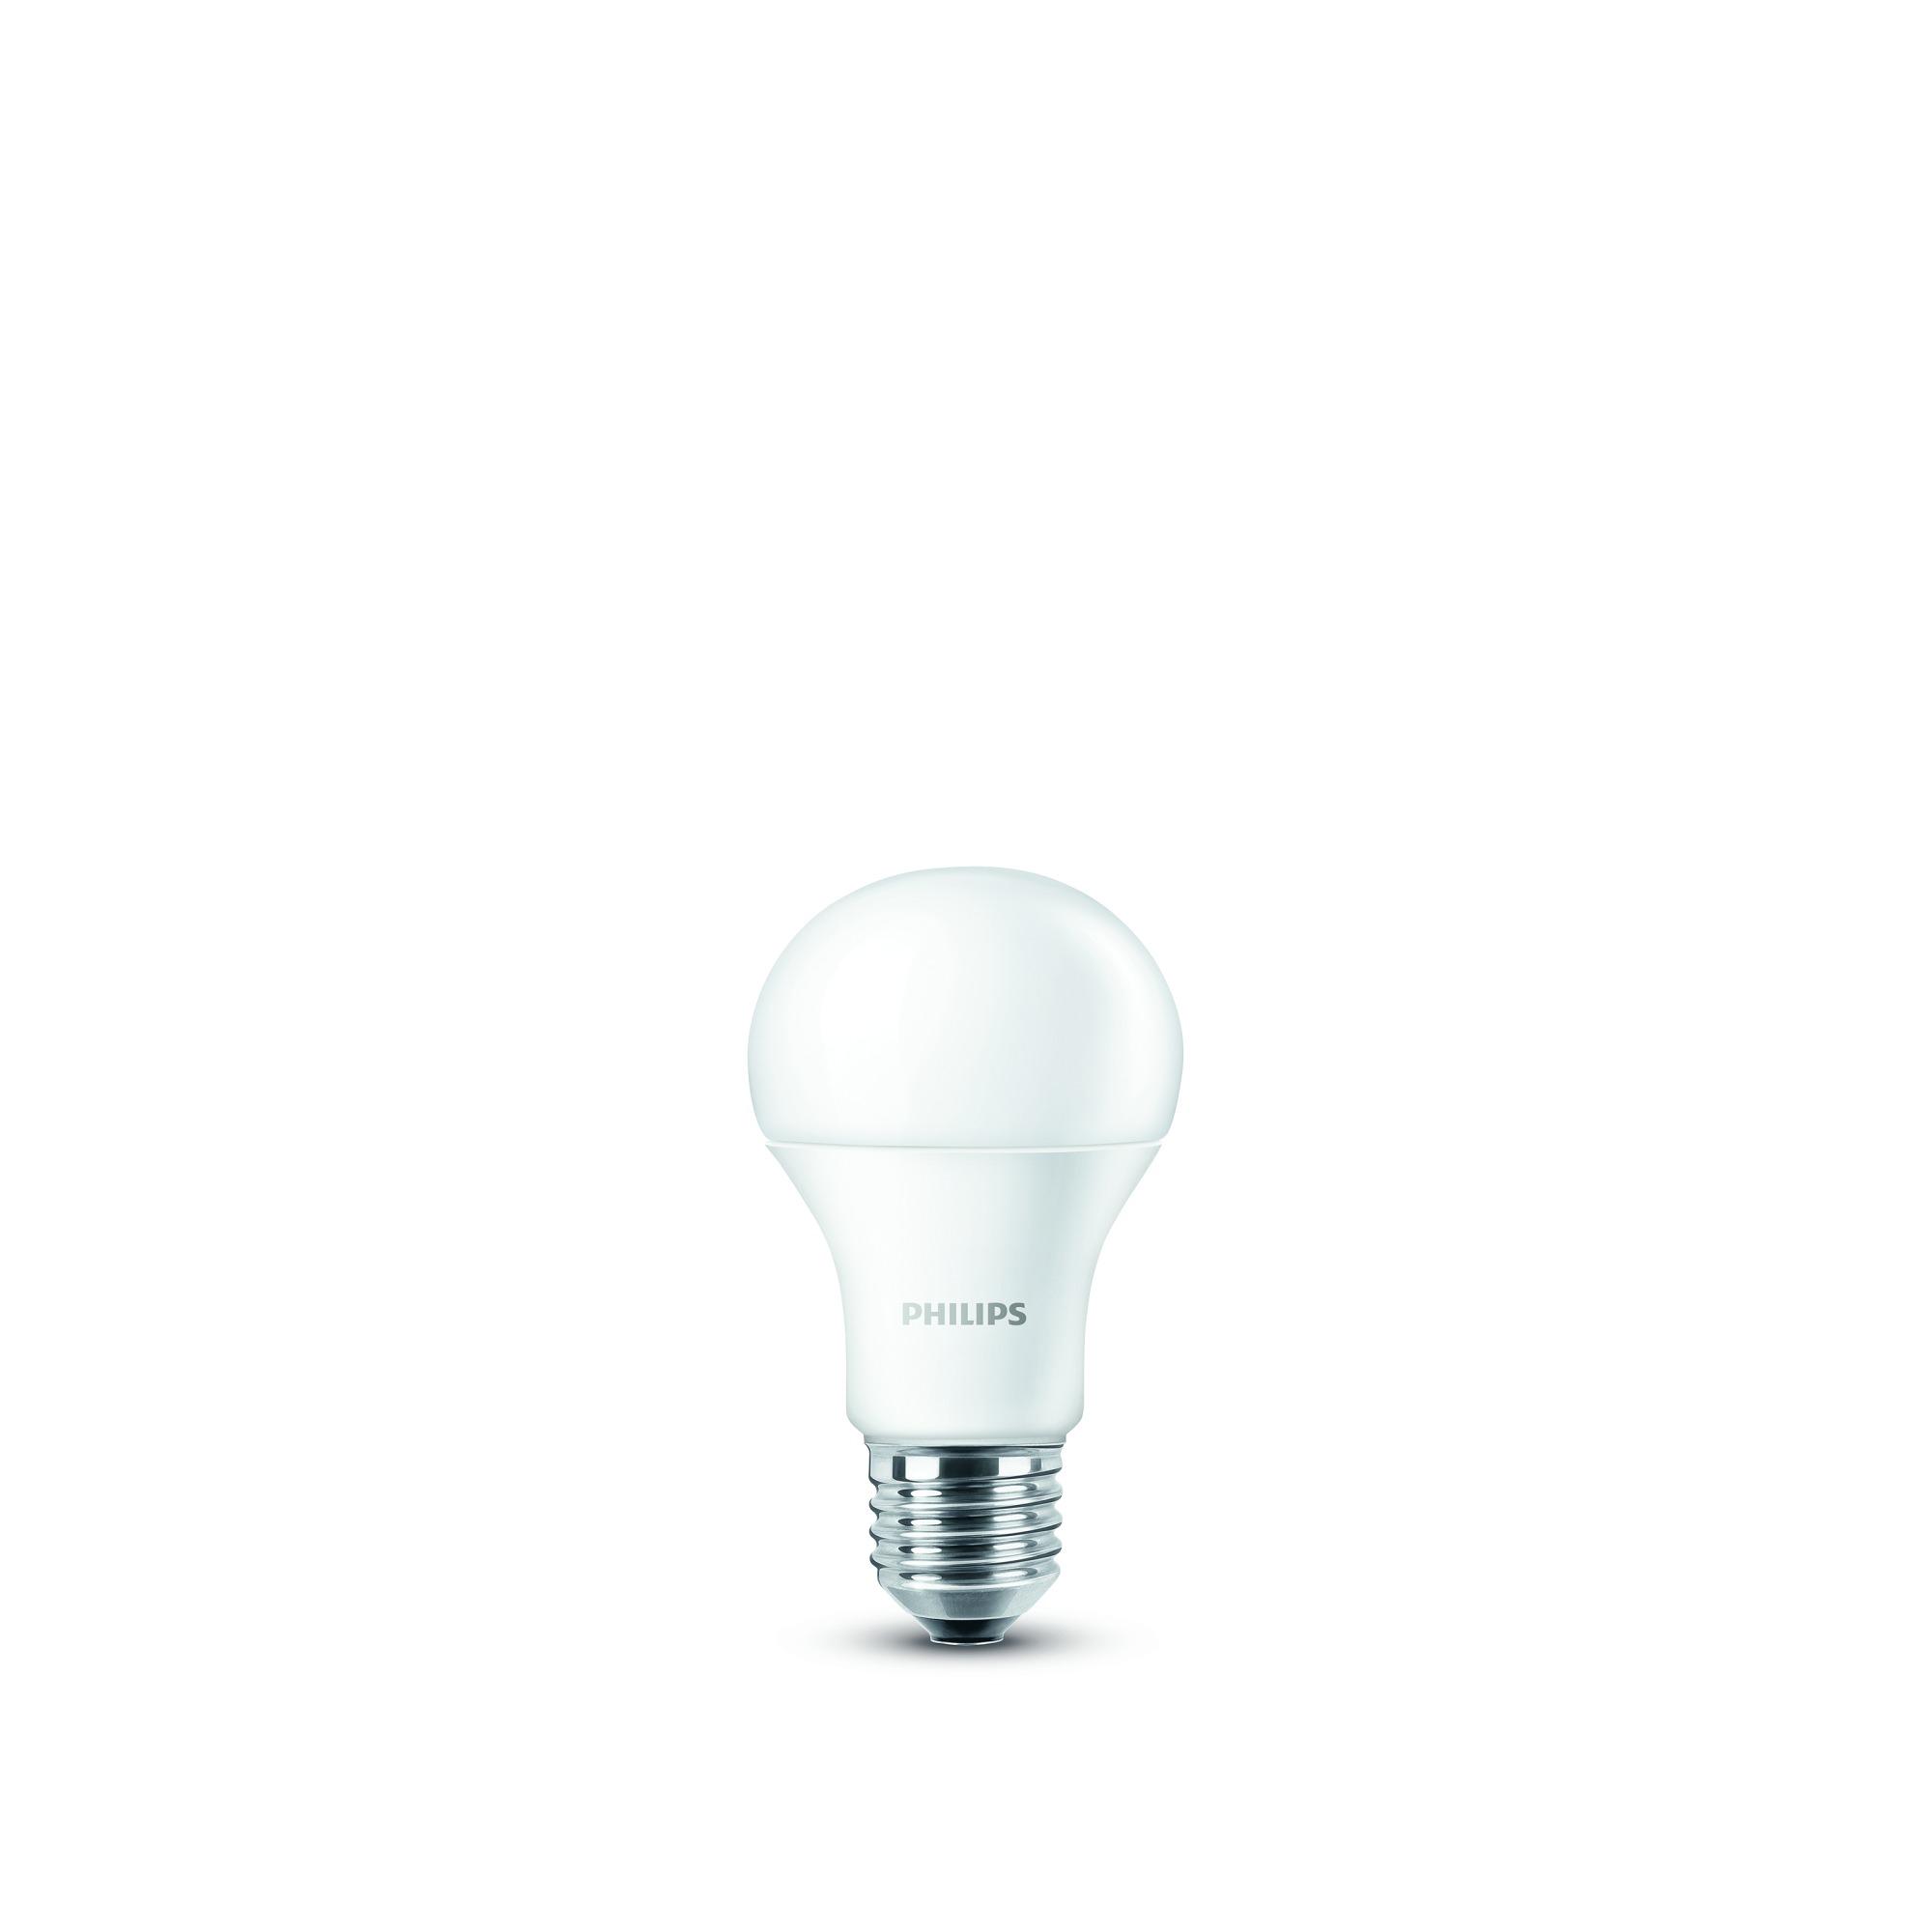 philips led peerlamp e27 1521 lumen 13 w 100w mat alle lampen lampen verlichting. Black Bedroom Furniture Sets. Home Design Ideas